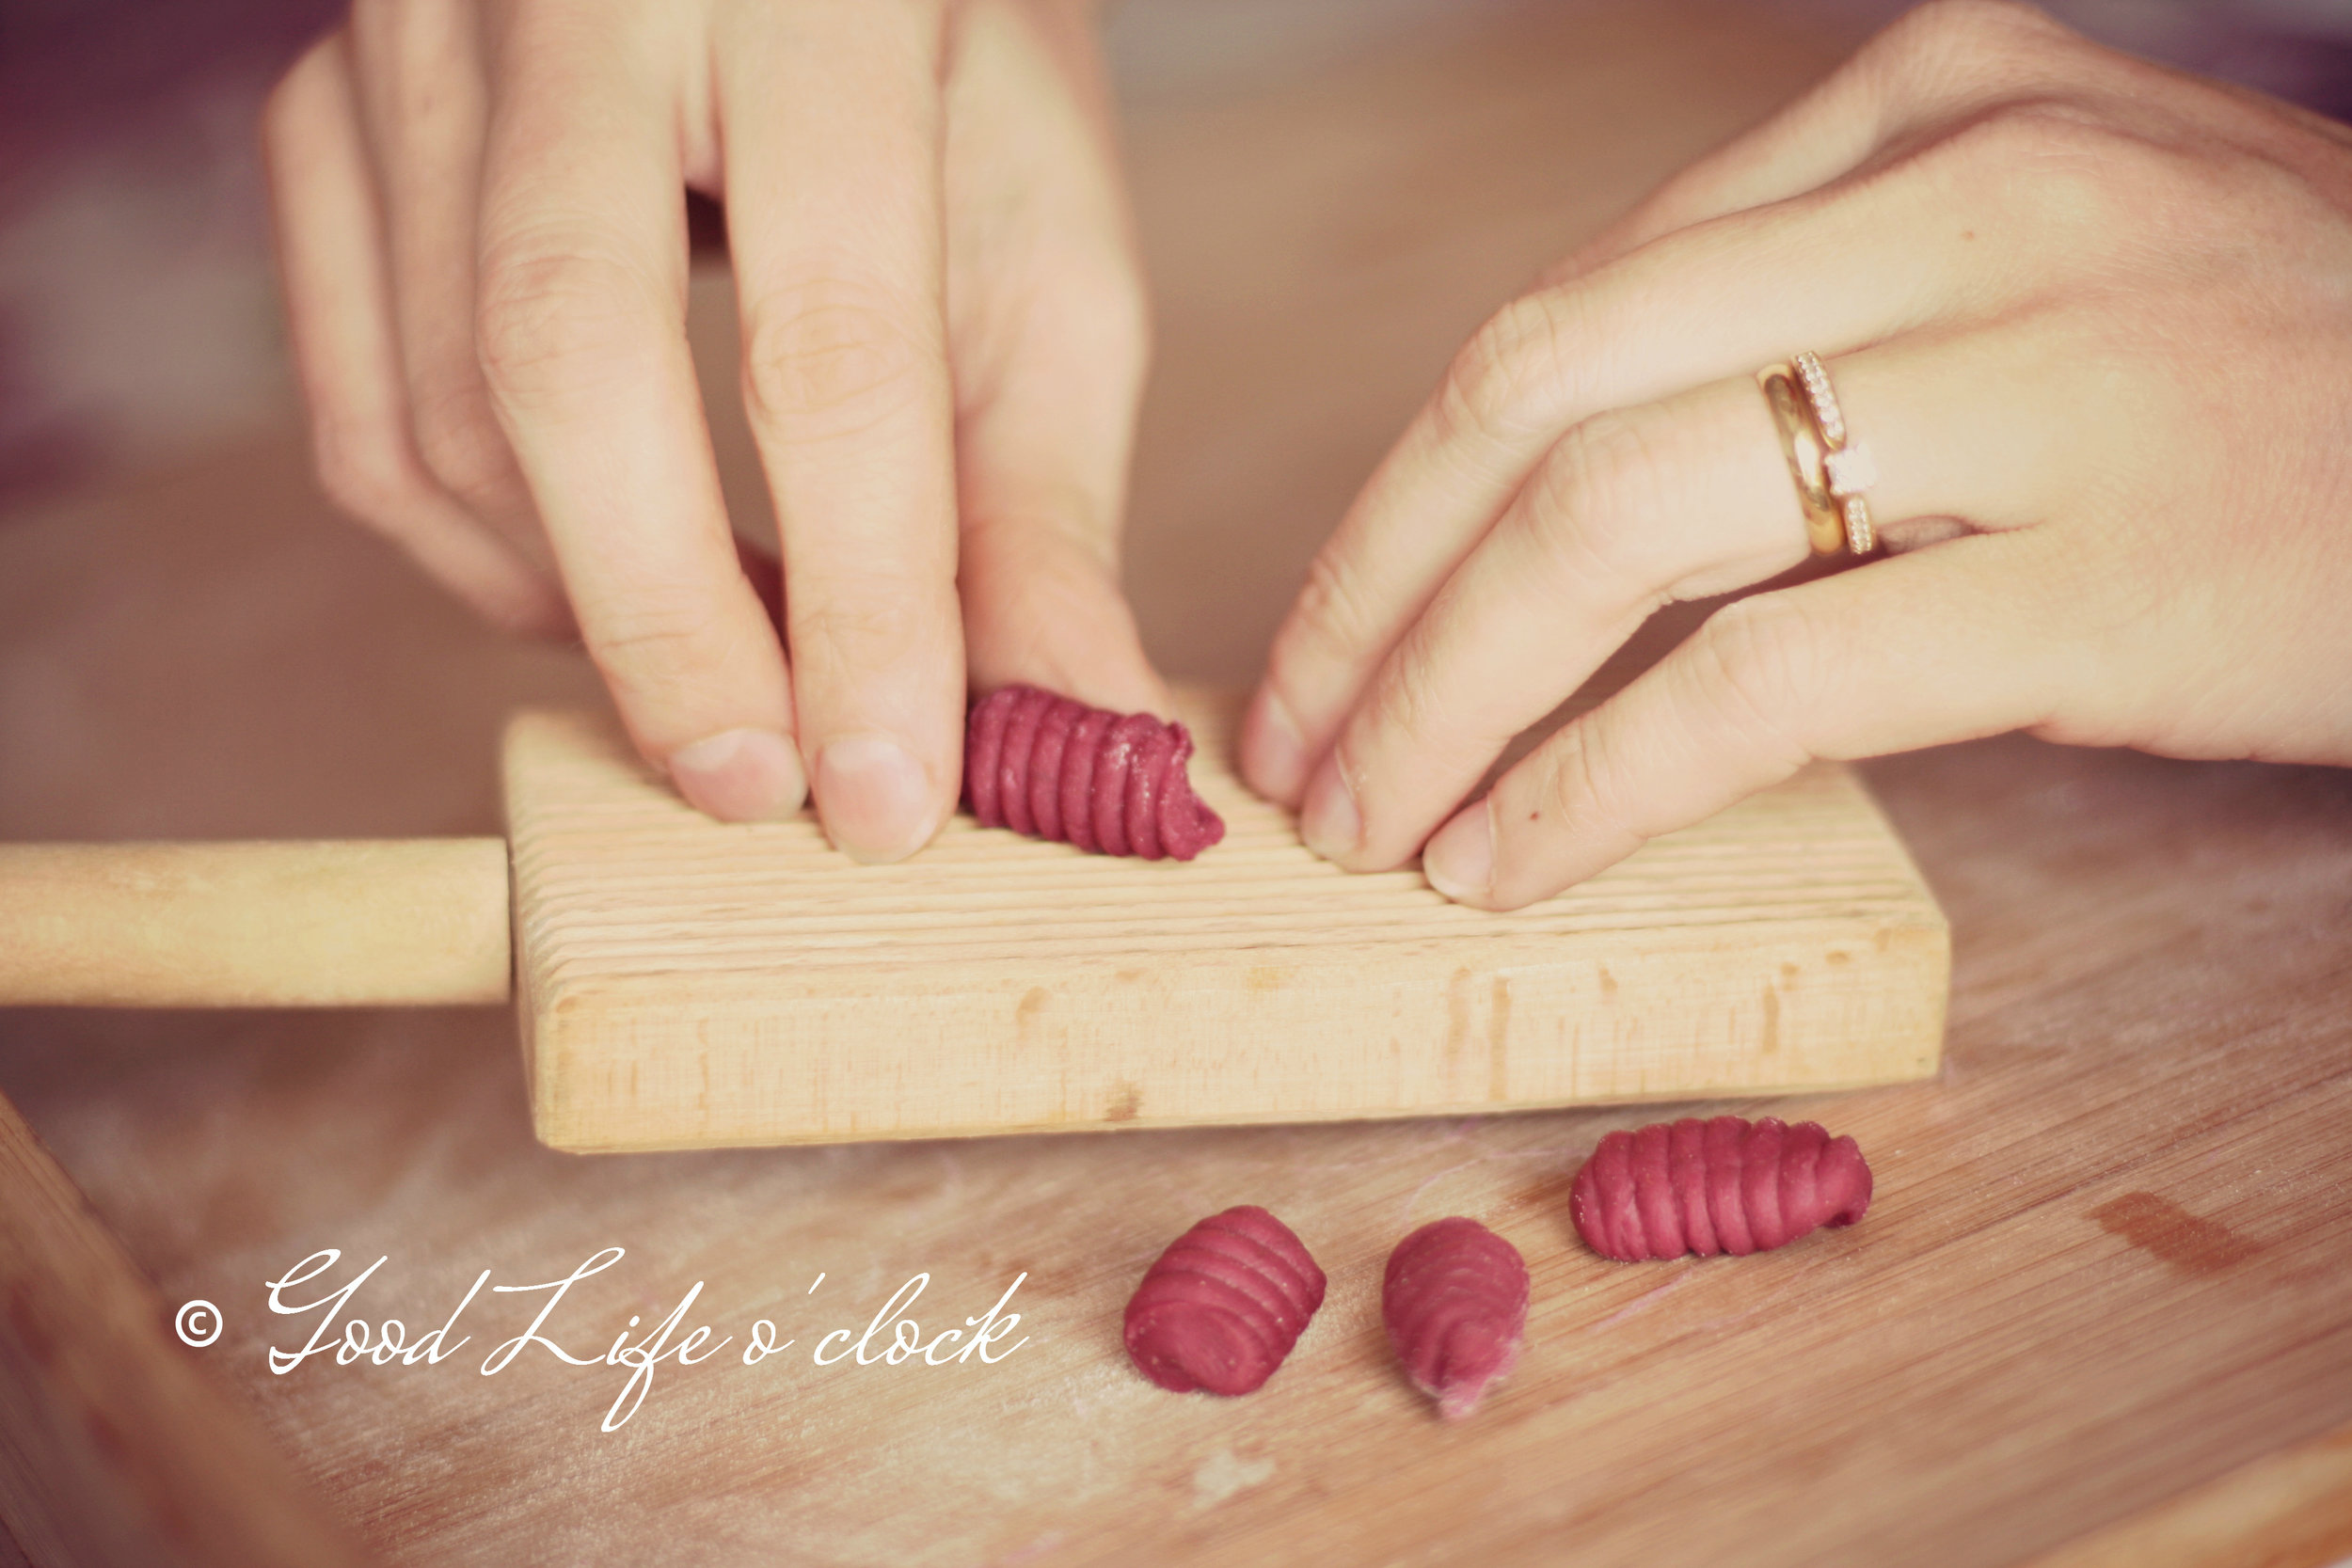 Gnocchi making process